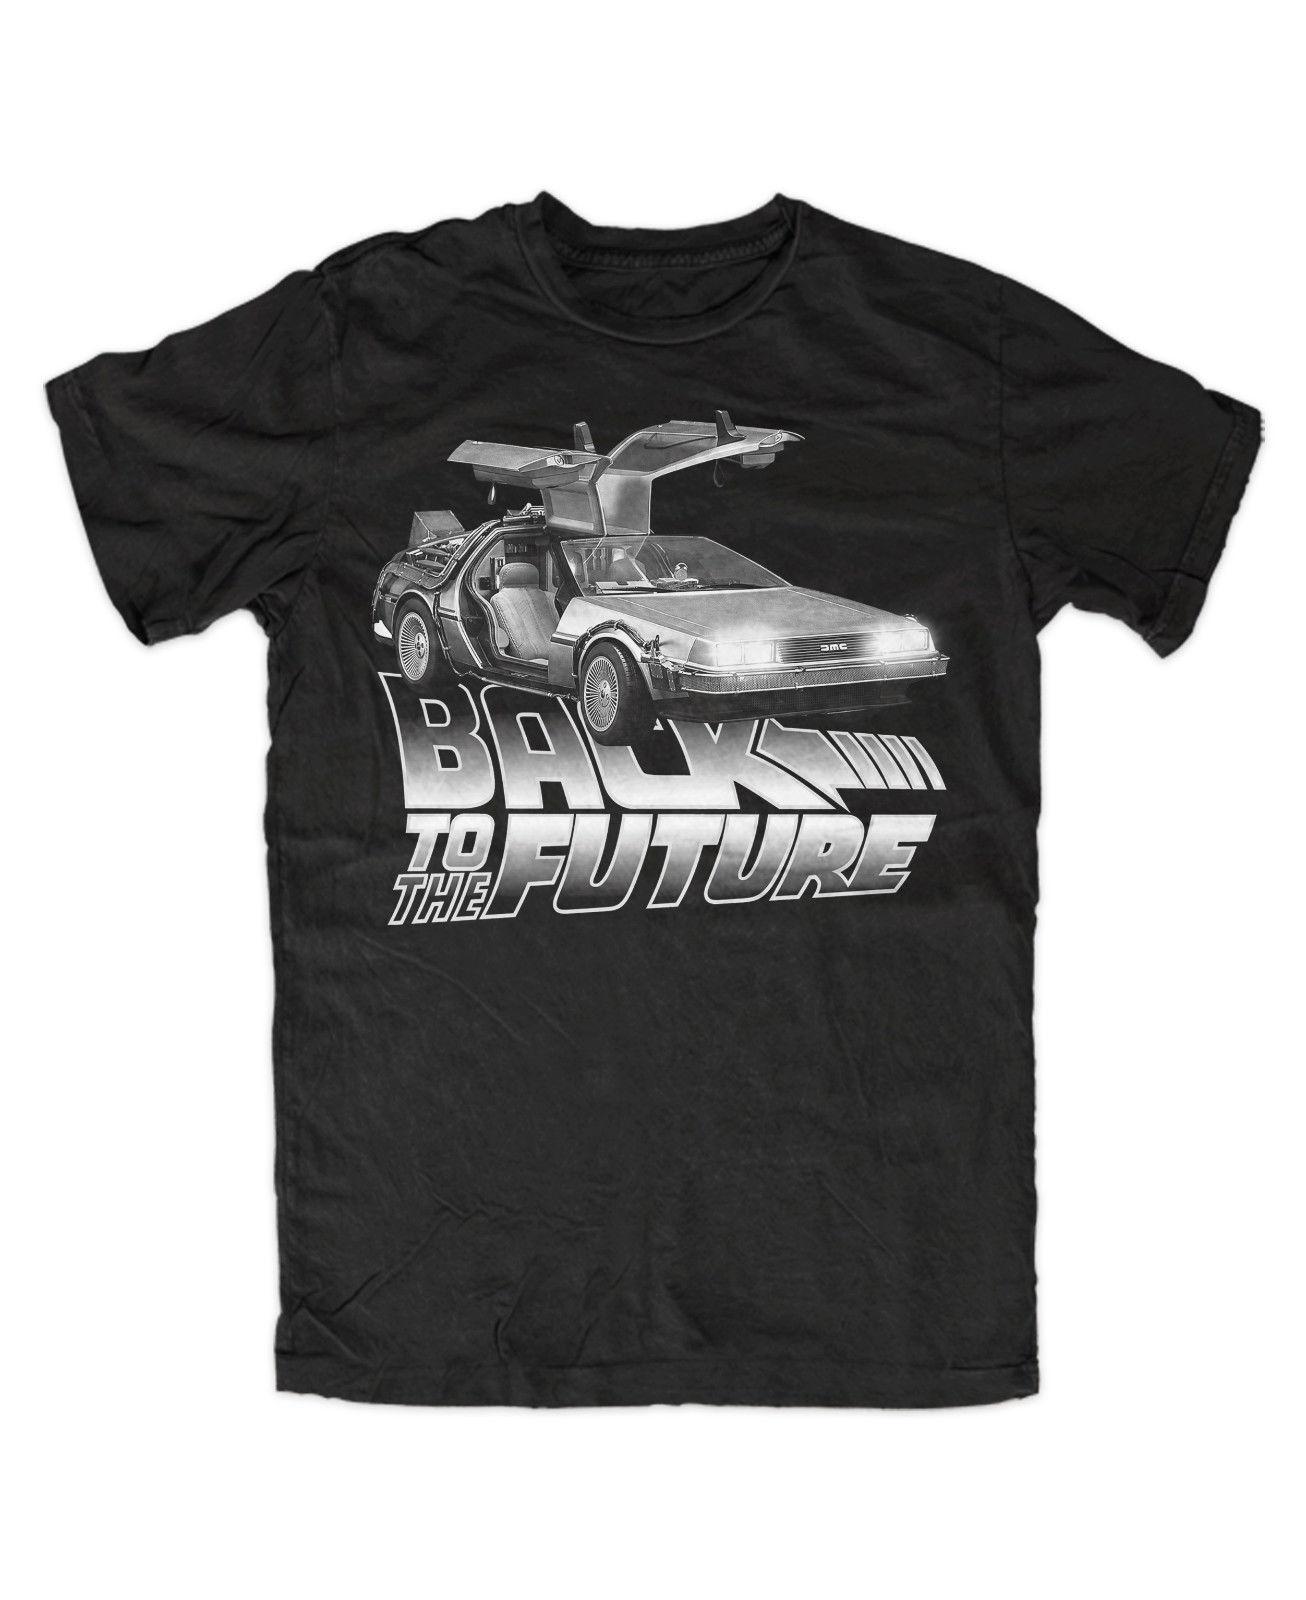 DeLorean M3 T-Shirt Schwarz ,Back to the future,Timemachine,Doc,Mc Fly,Kult,Fun Print T Shirt Men Brand Clothing T-Shirt